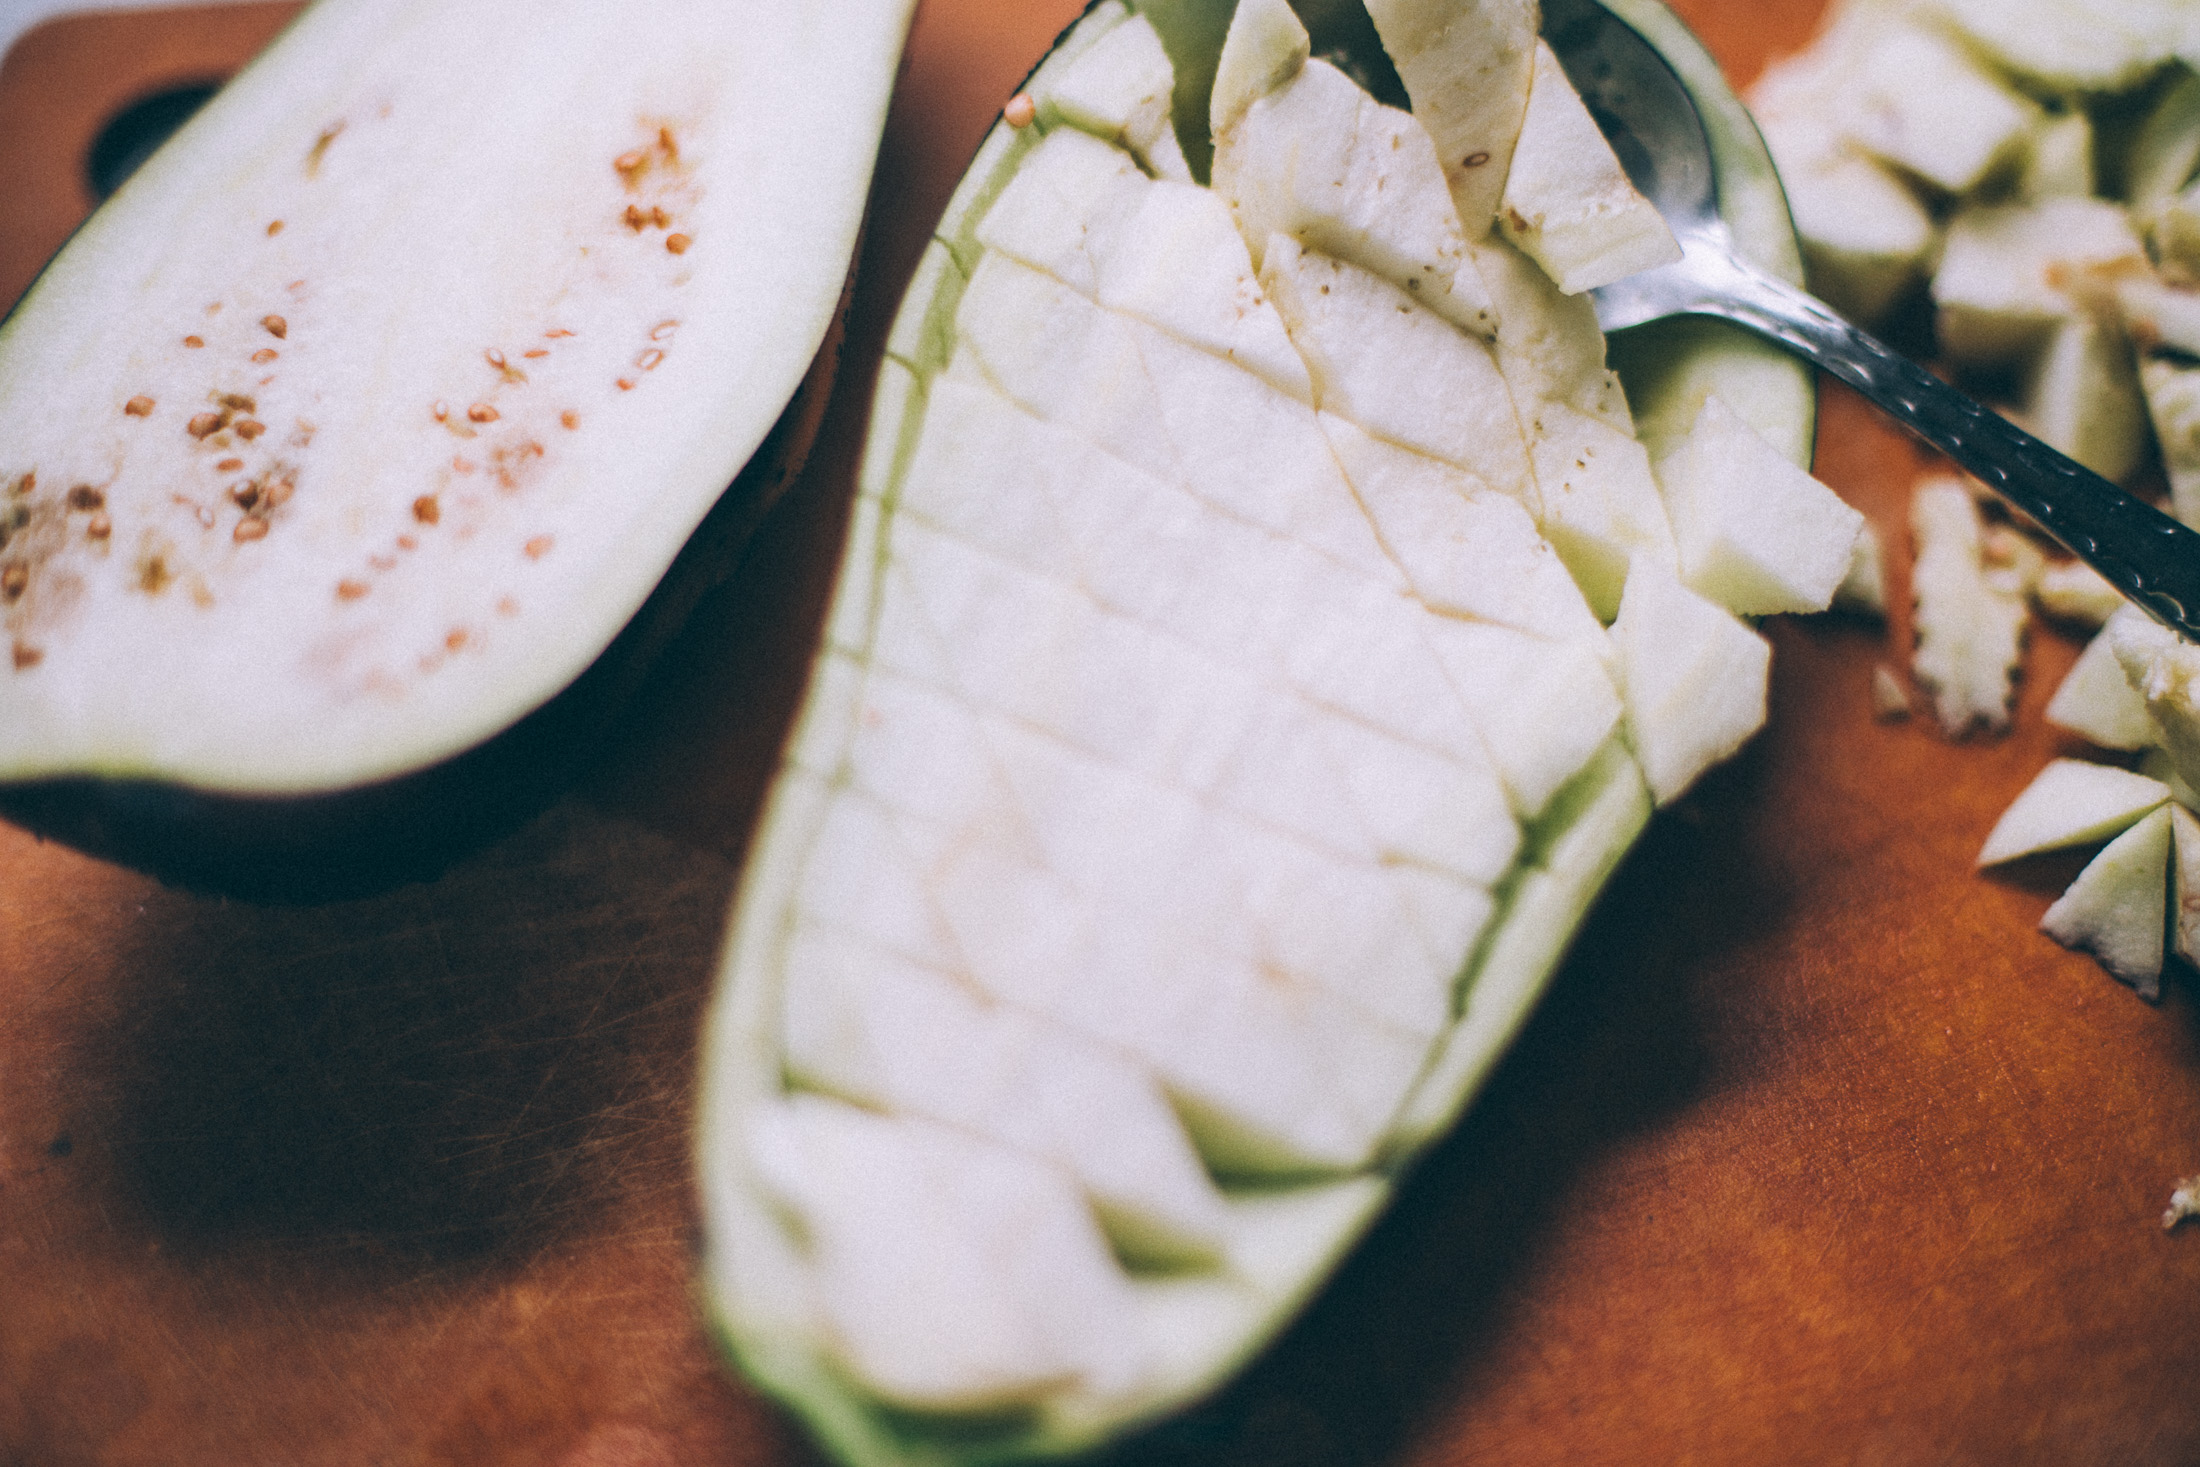 twice baked vegan eggplant parmesan recipe via willfrolicforfood.com